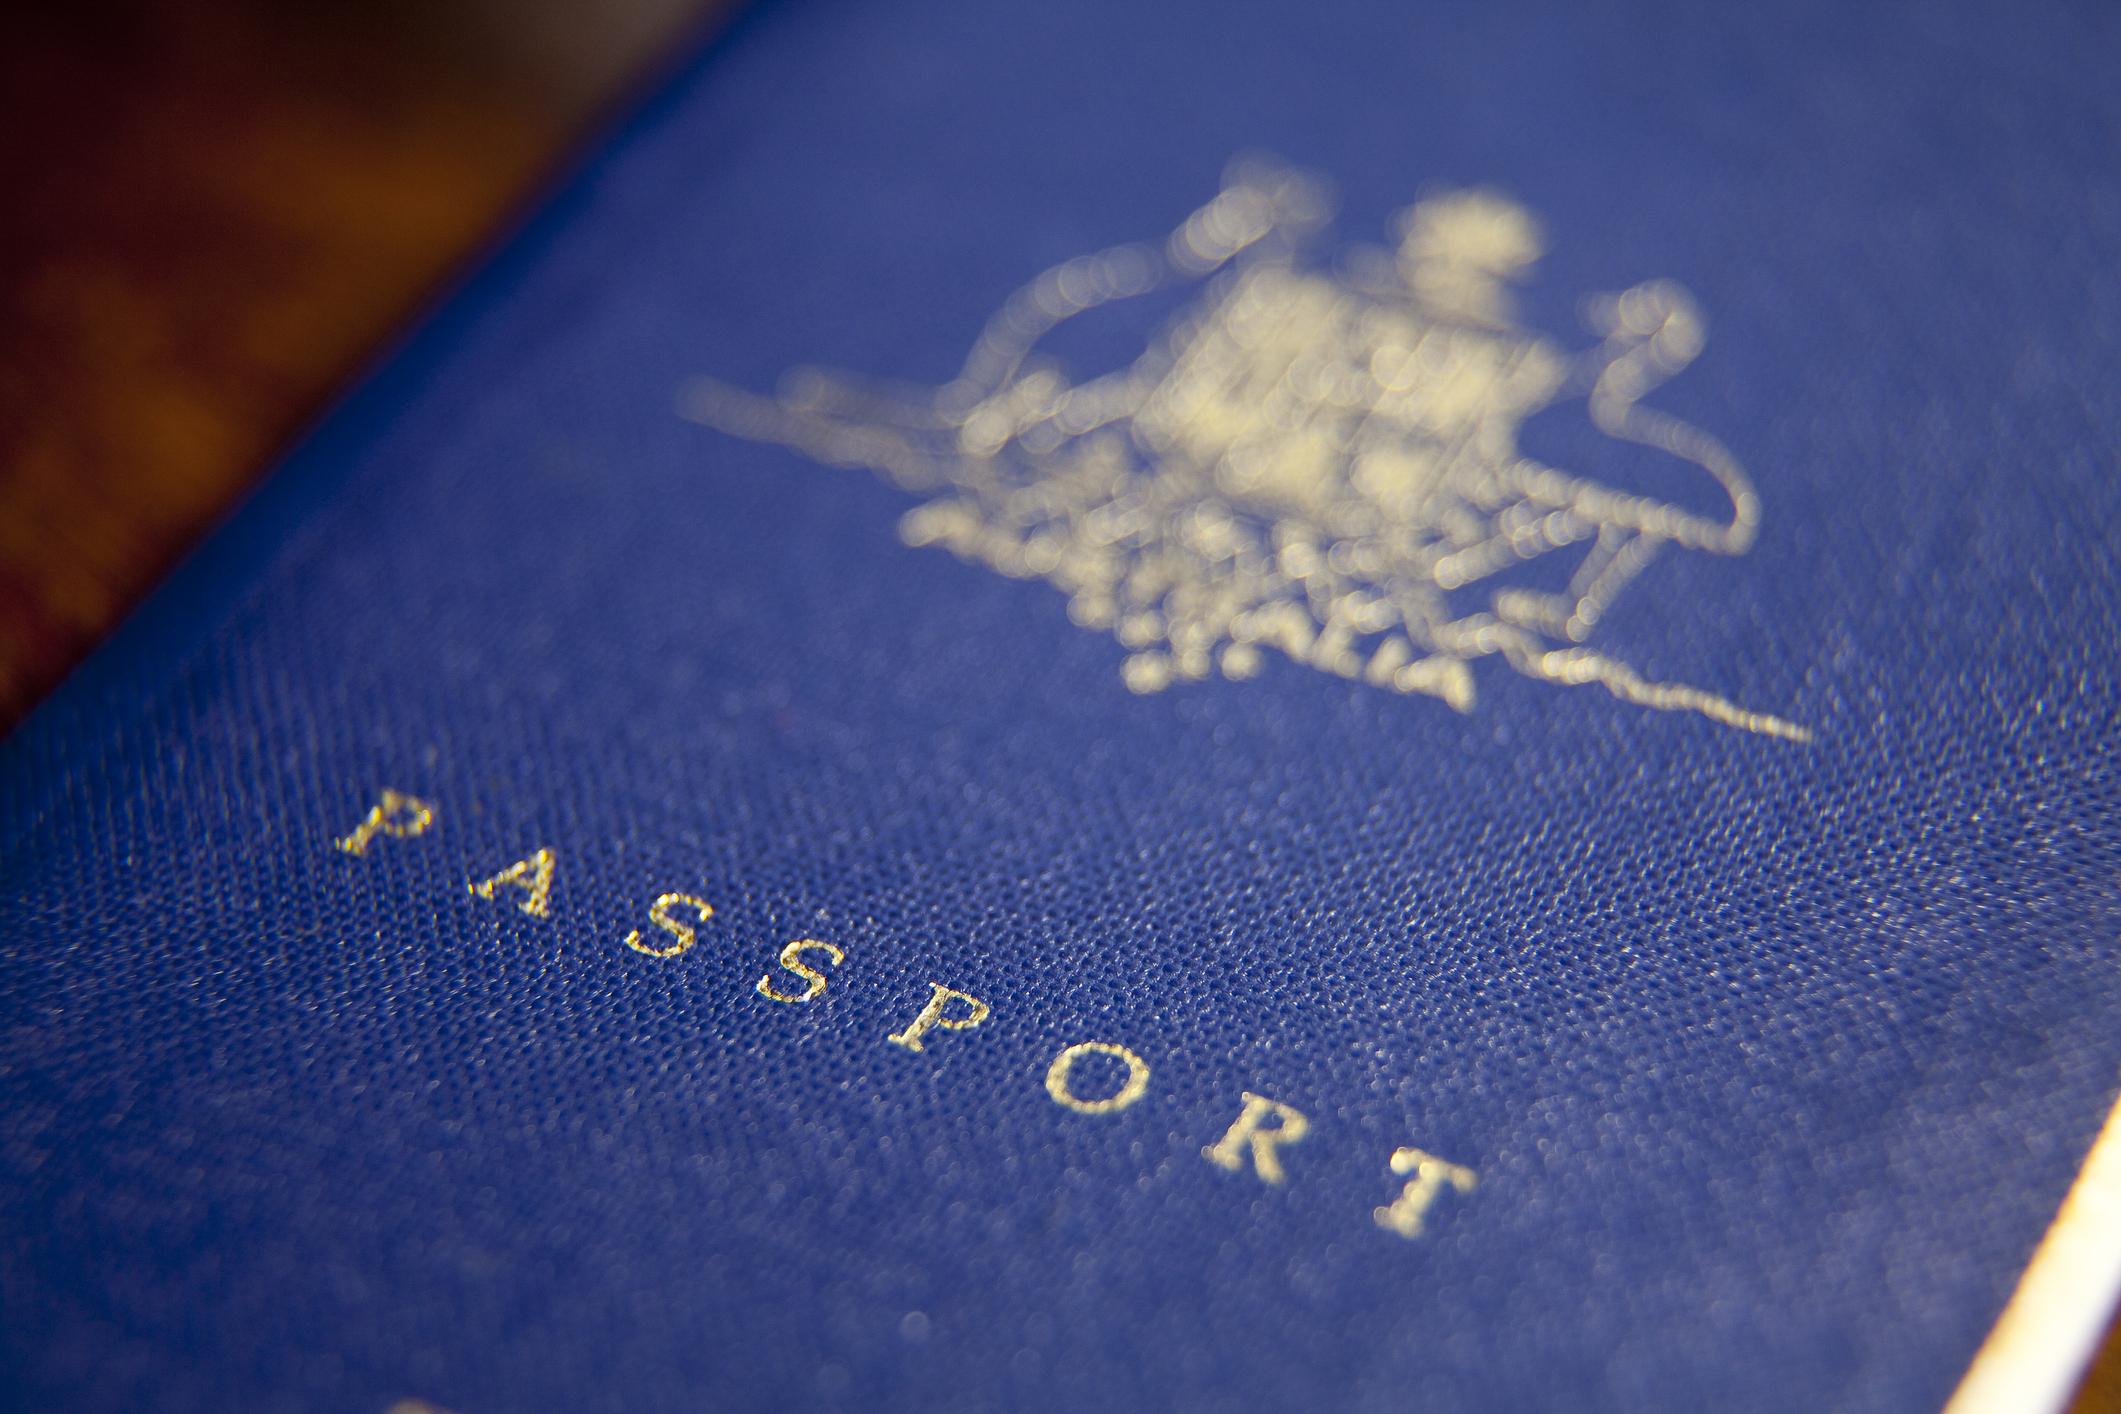 Aussie travellers must return NOW before borders shut